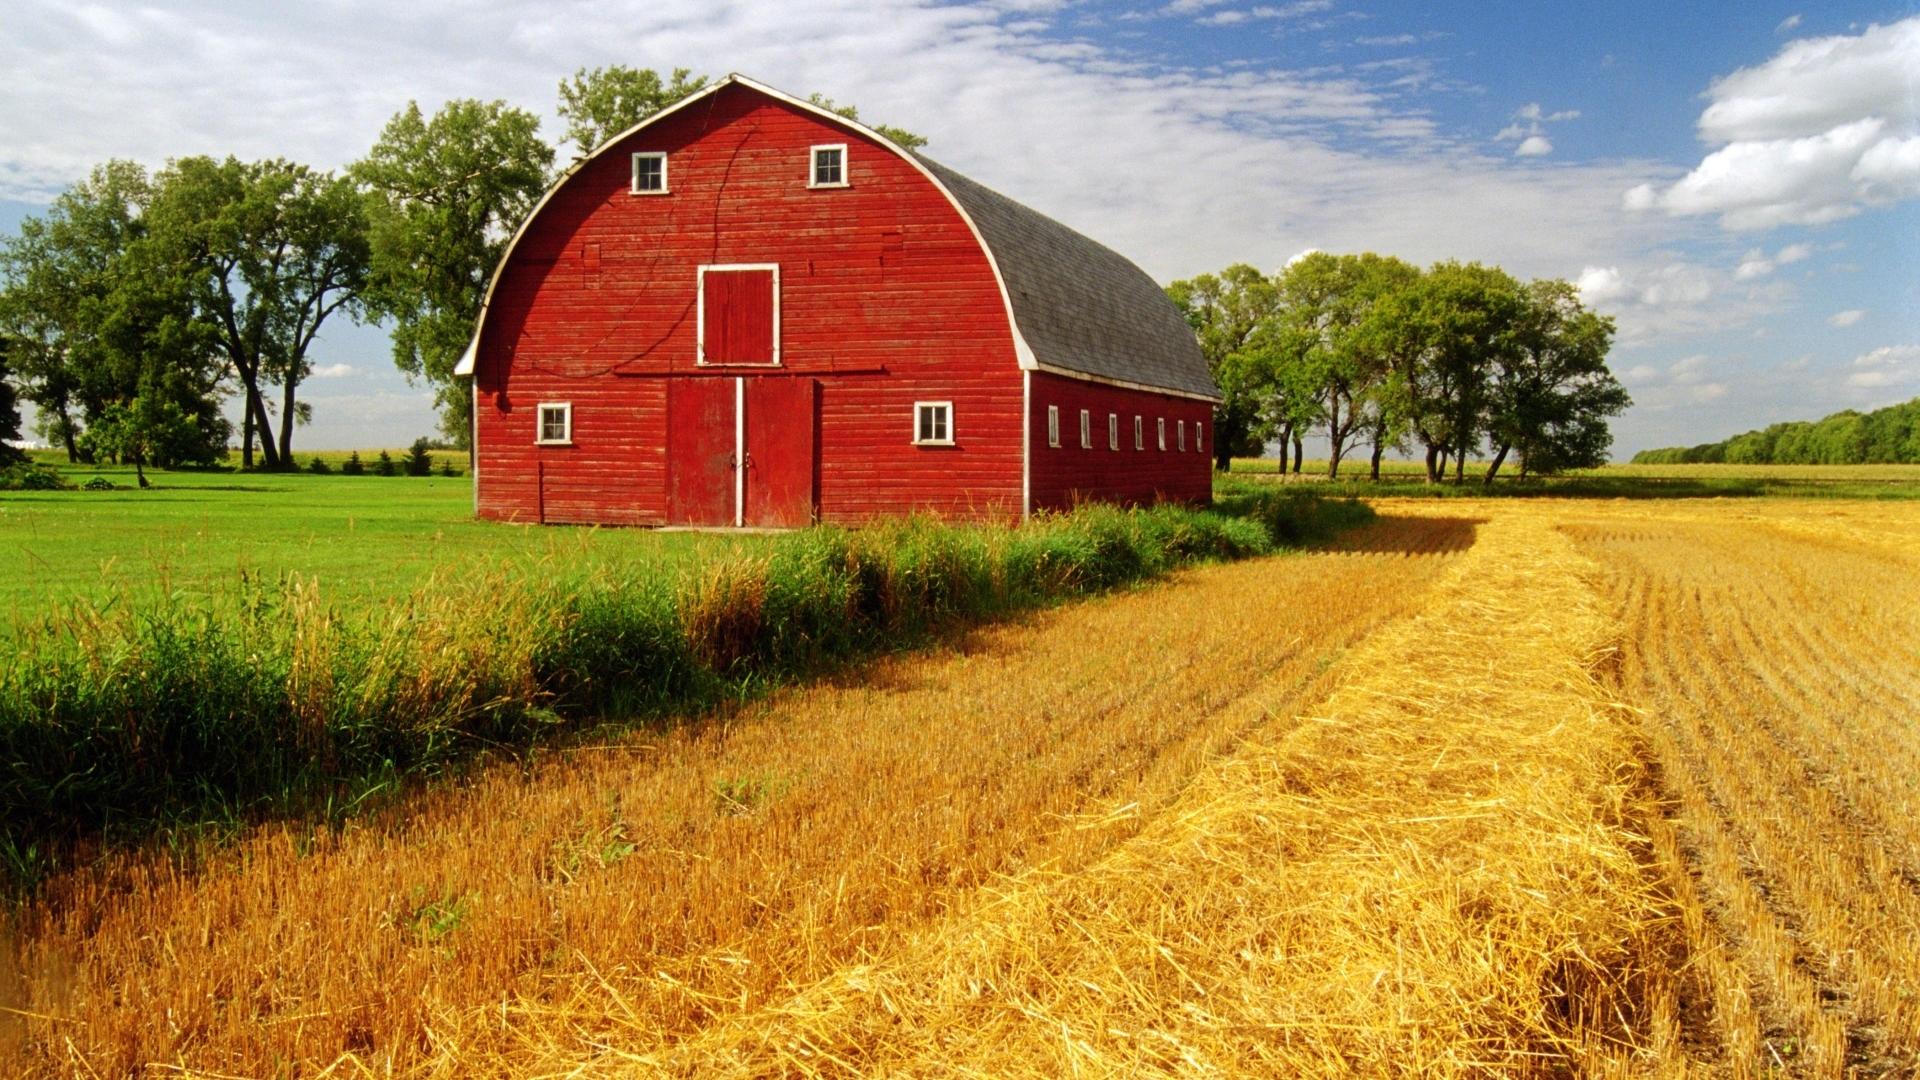 barn rustic farm landscapes fields crop grass sky clouds wallpaper 1920x1080